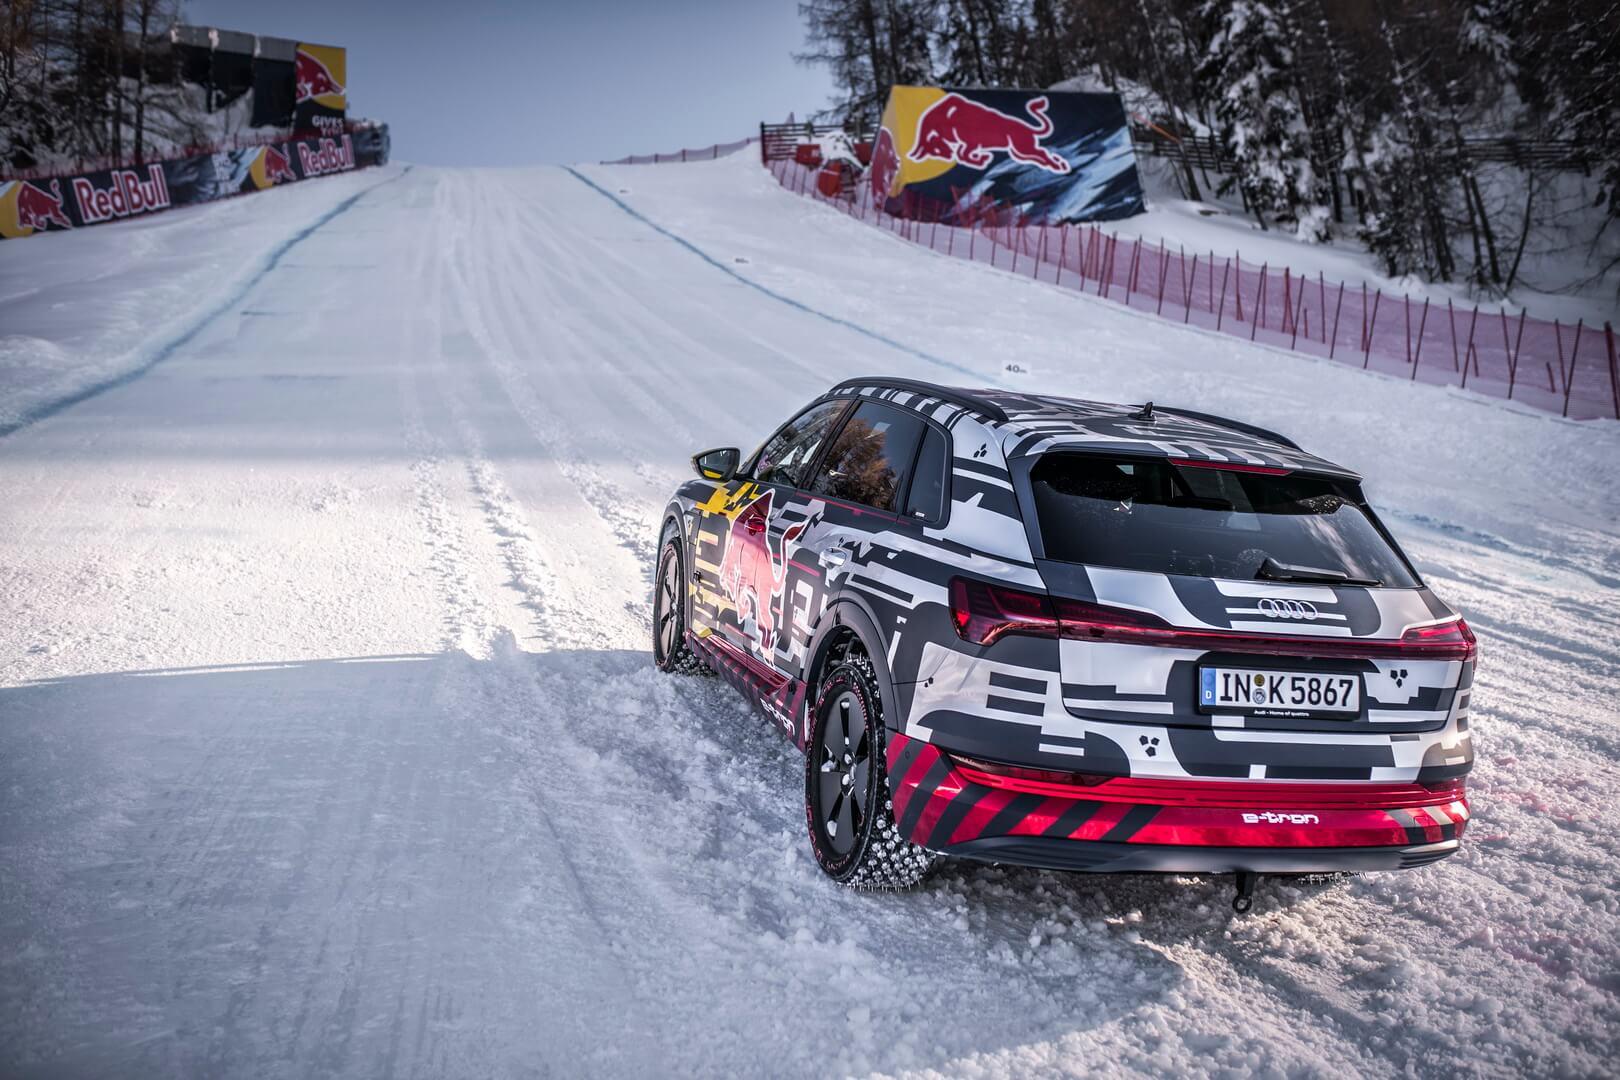 Audi e-tron quattro взобрался наледяной склон в85градусов